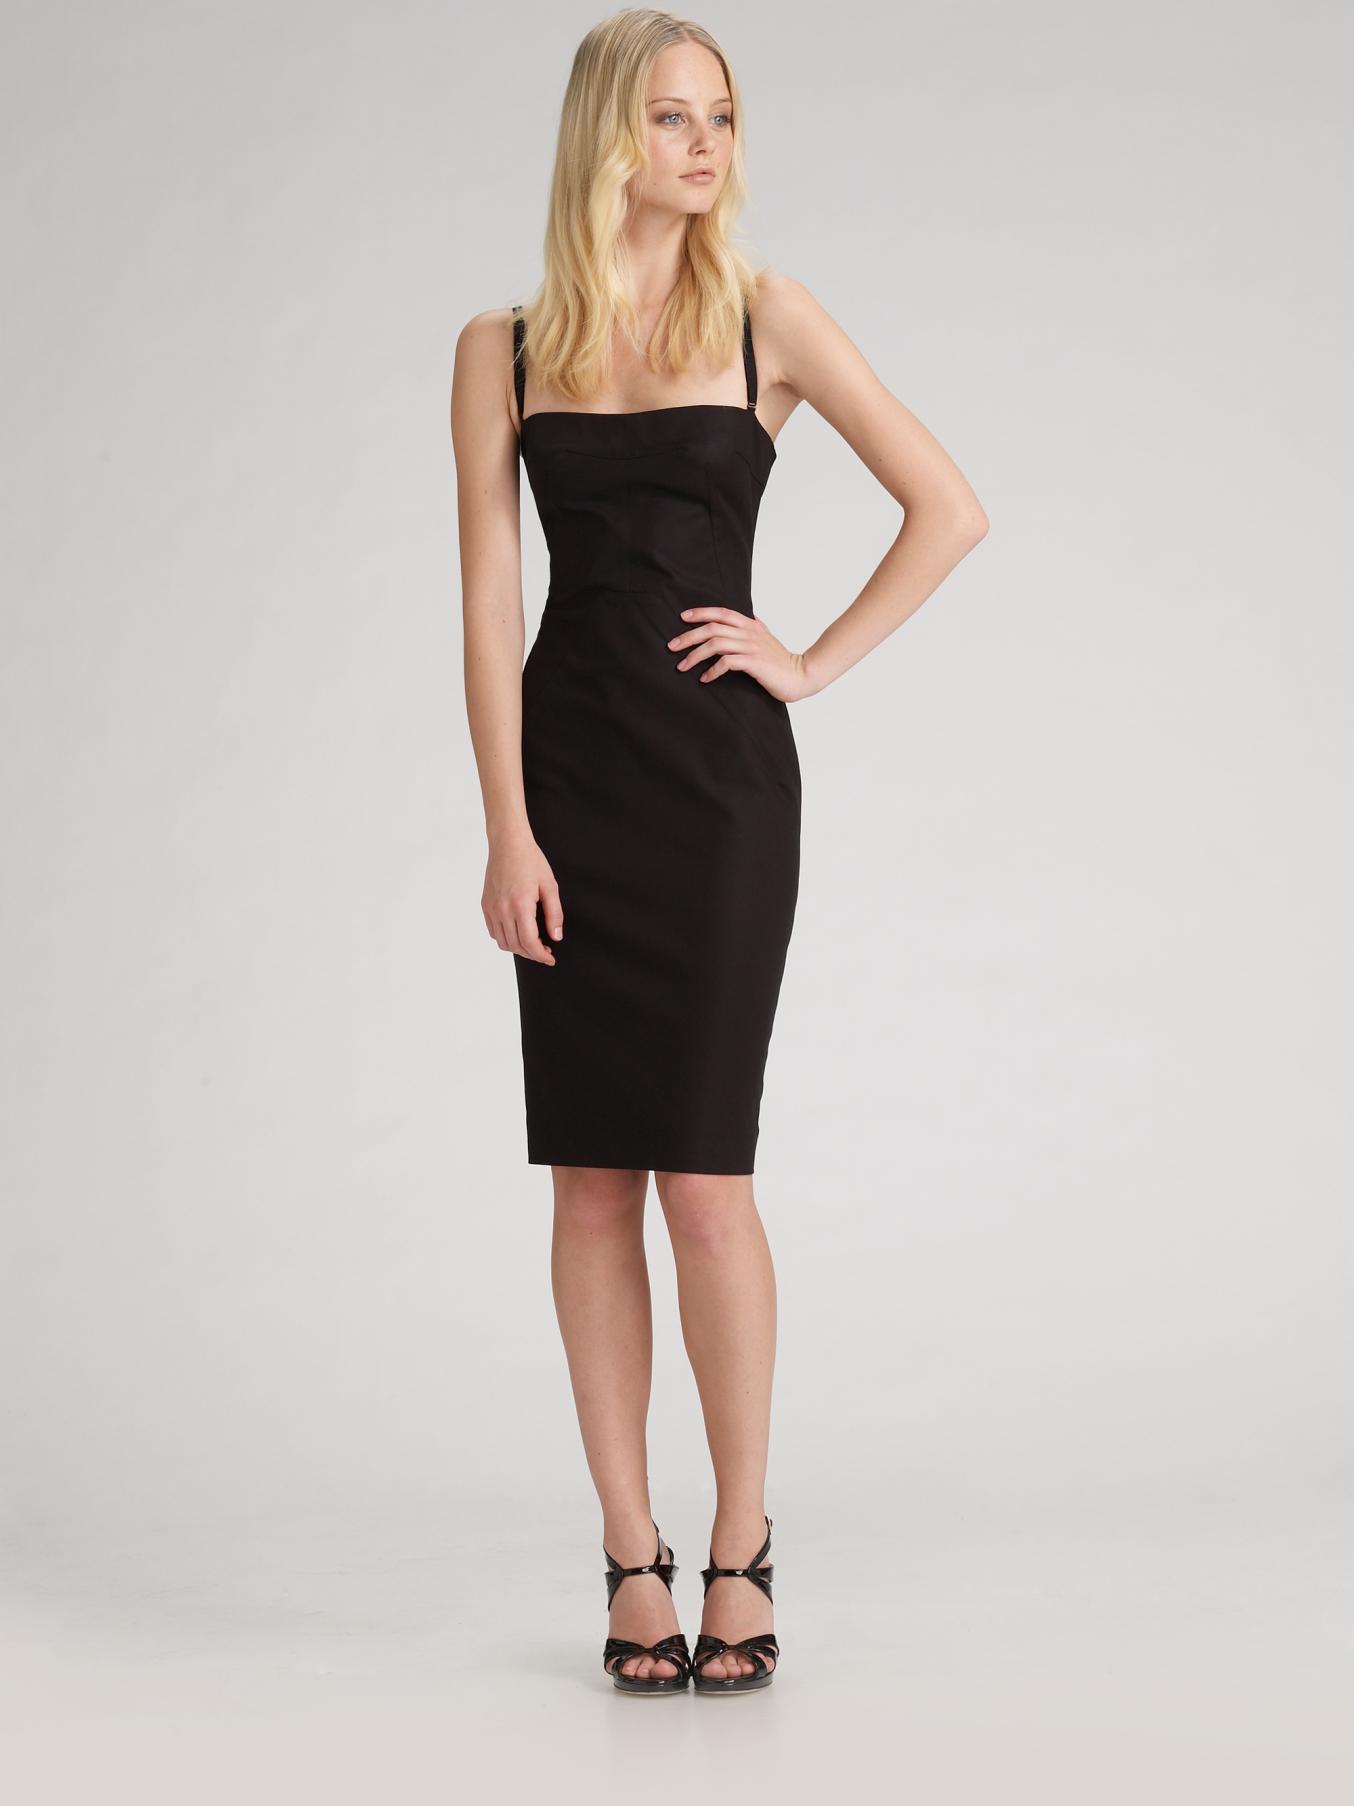 Dolce &amp- gabbana Bustier Sheath Dress in Black - Lyst